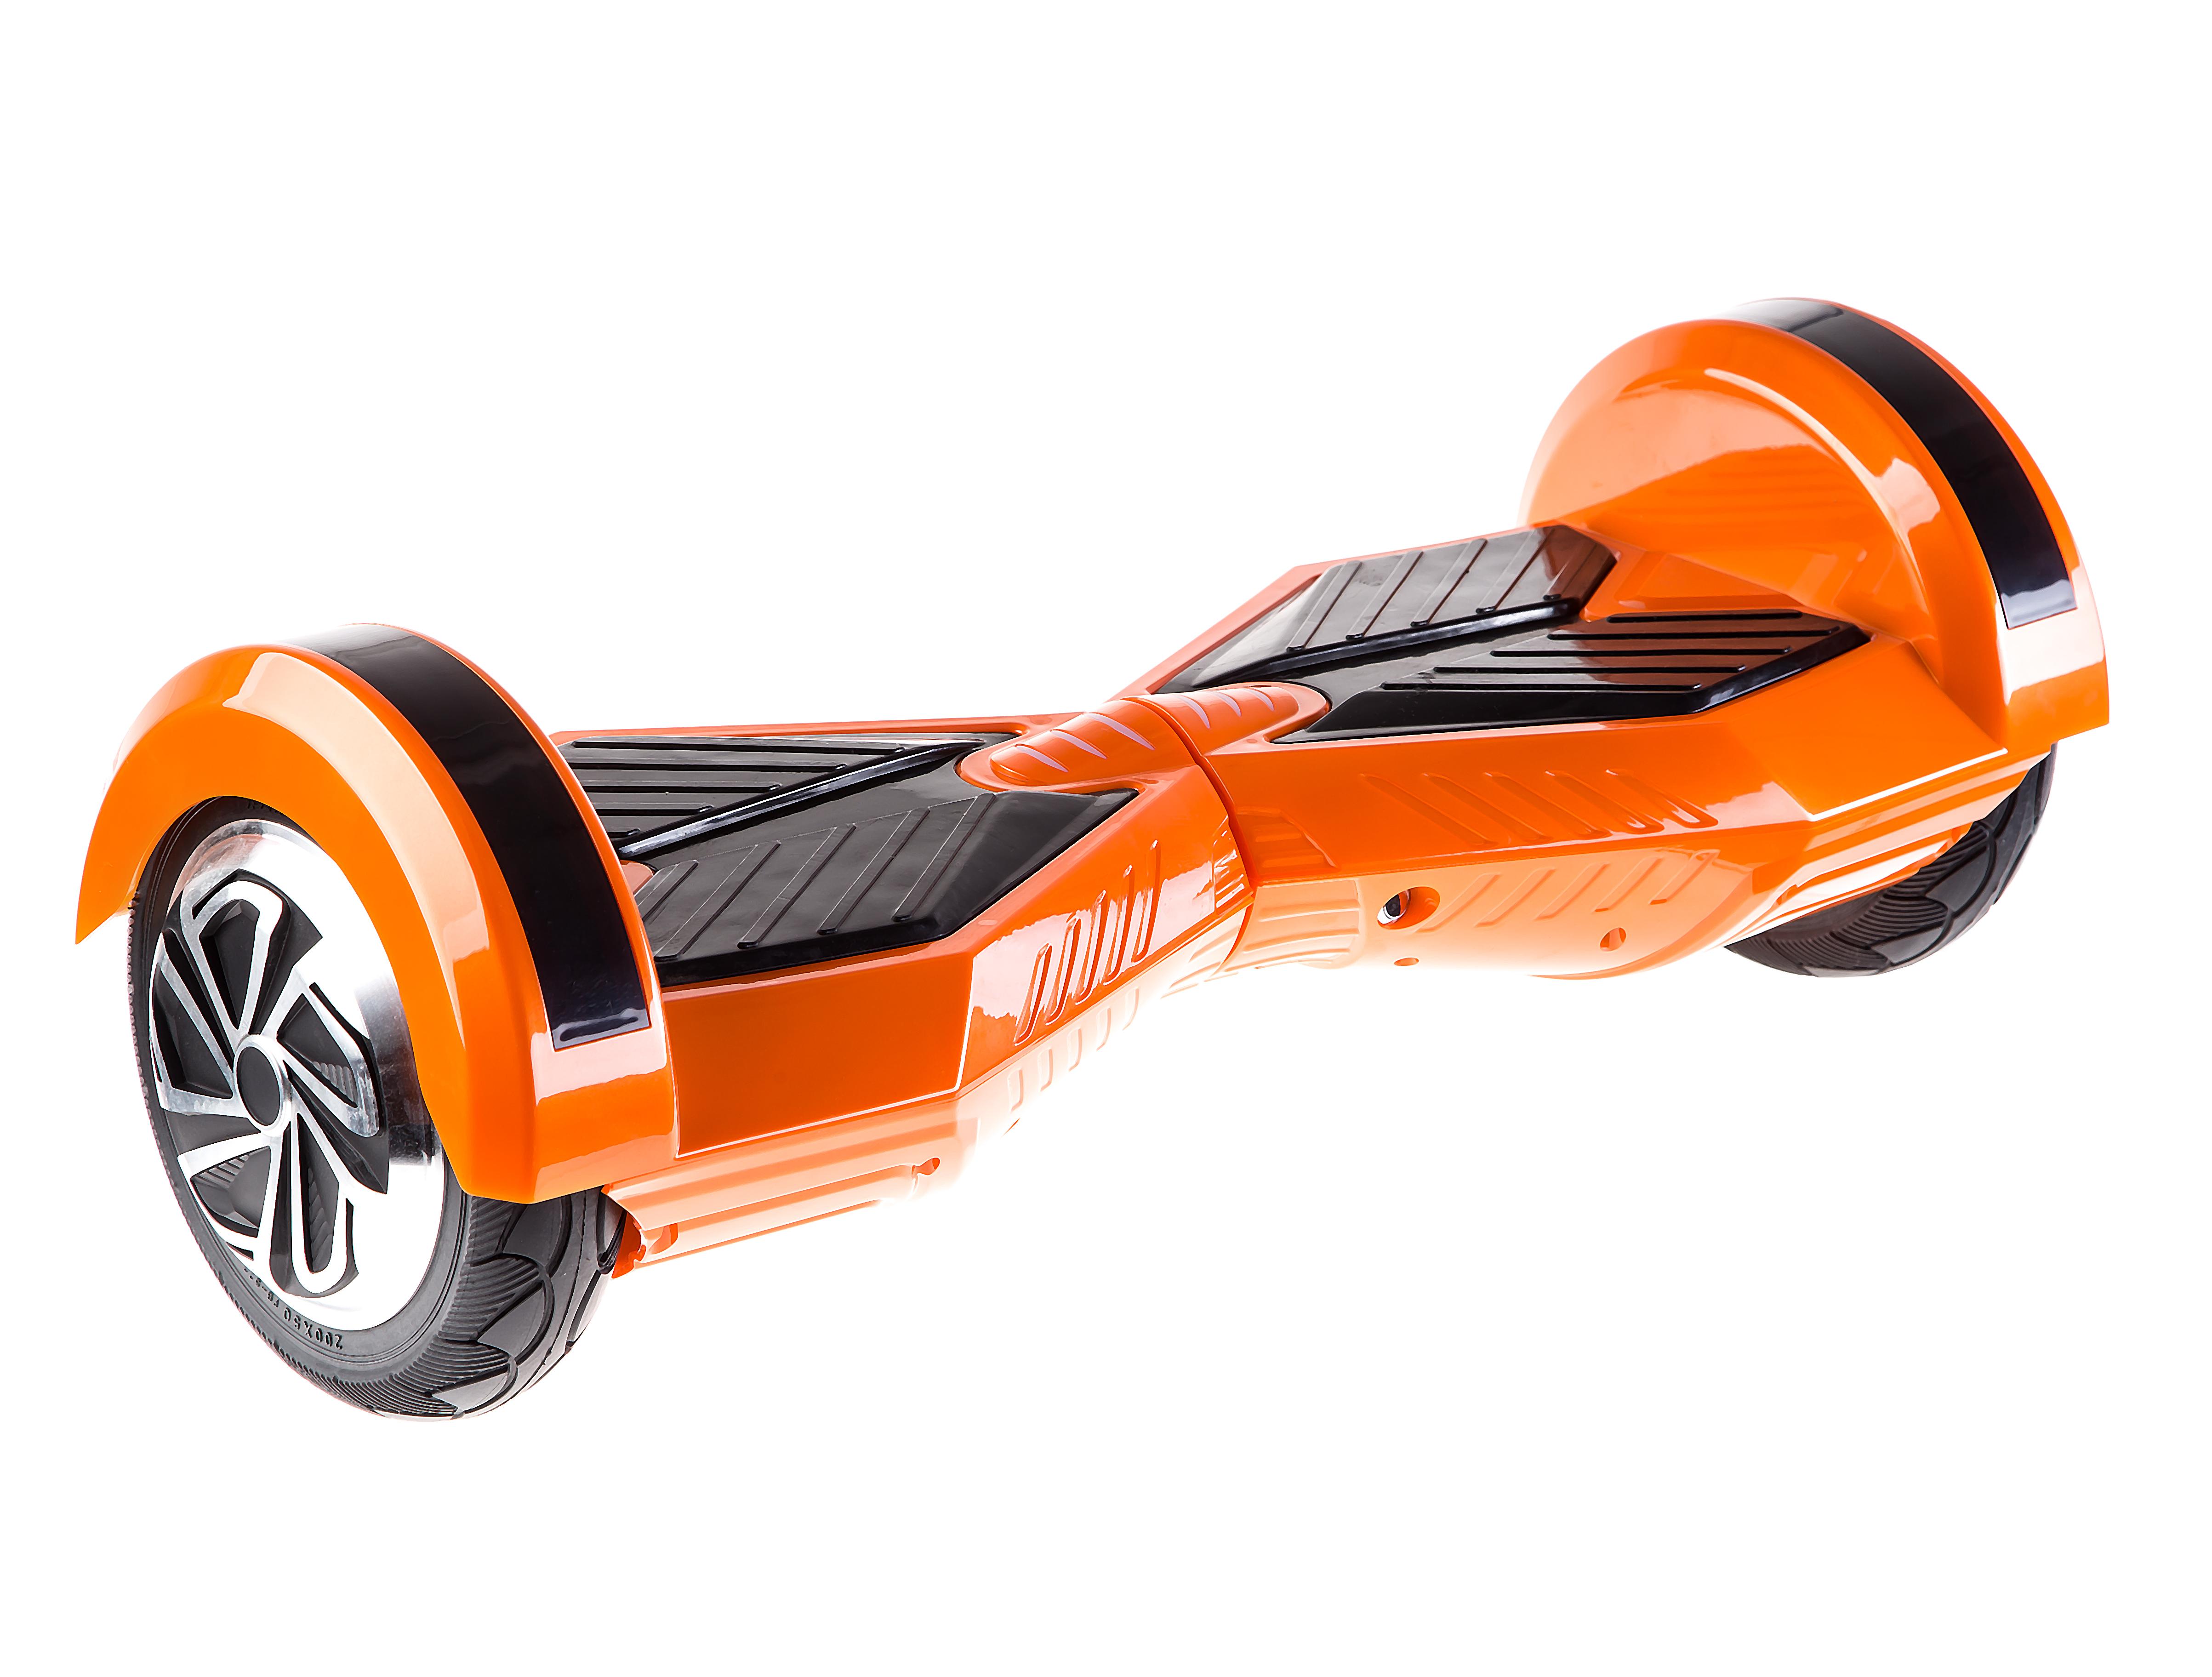 Гироскутер Superbsail Slx-004/8 оранжевый